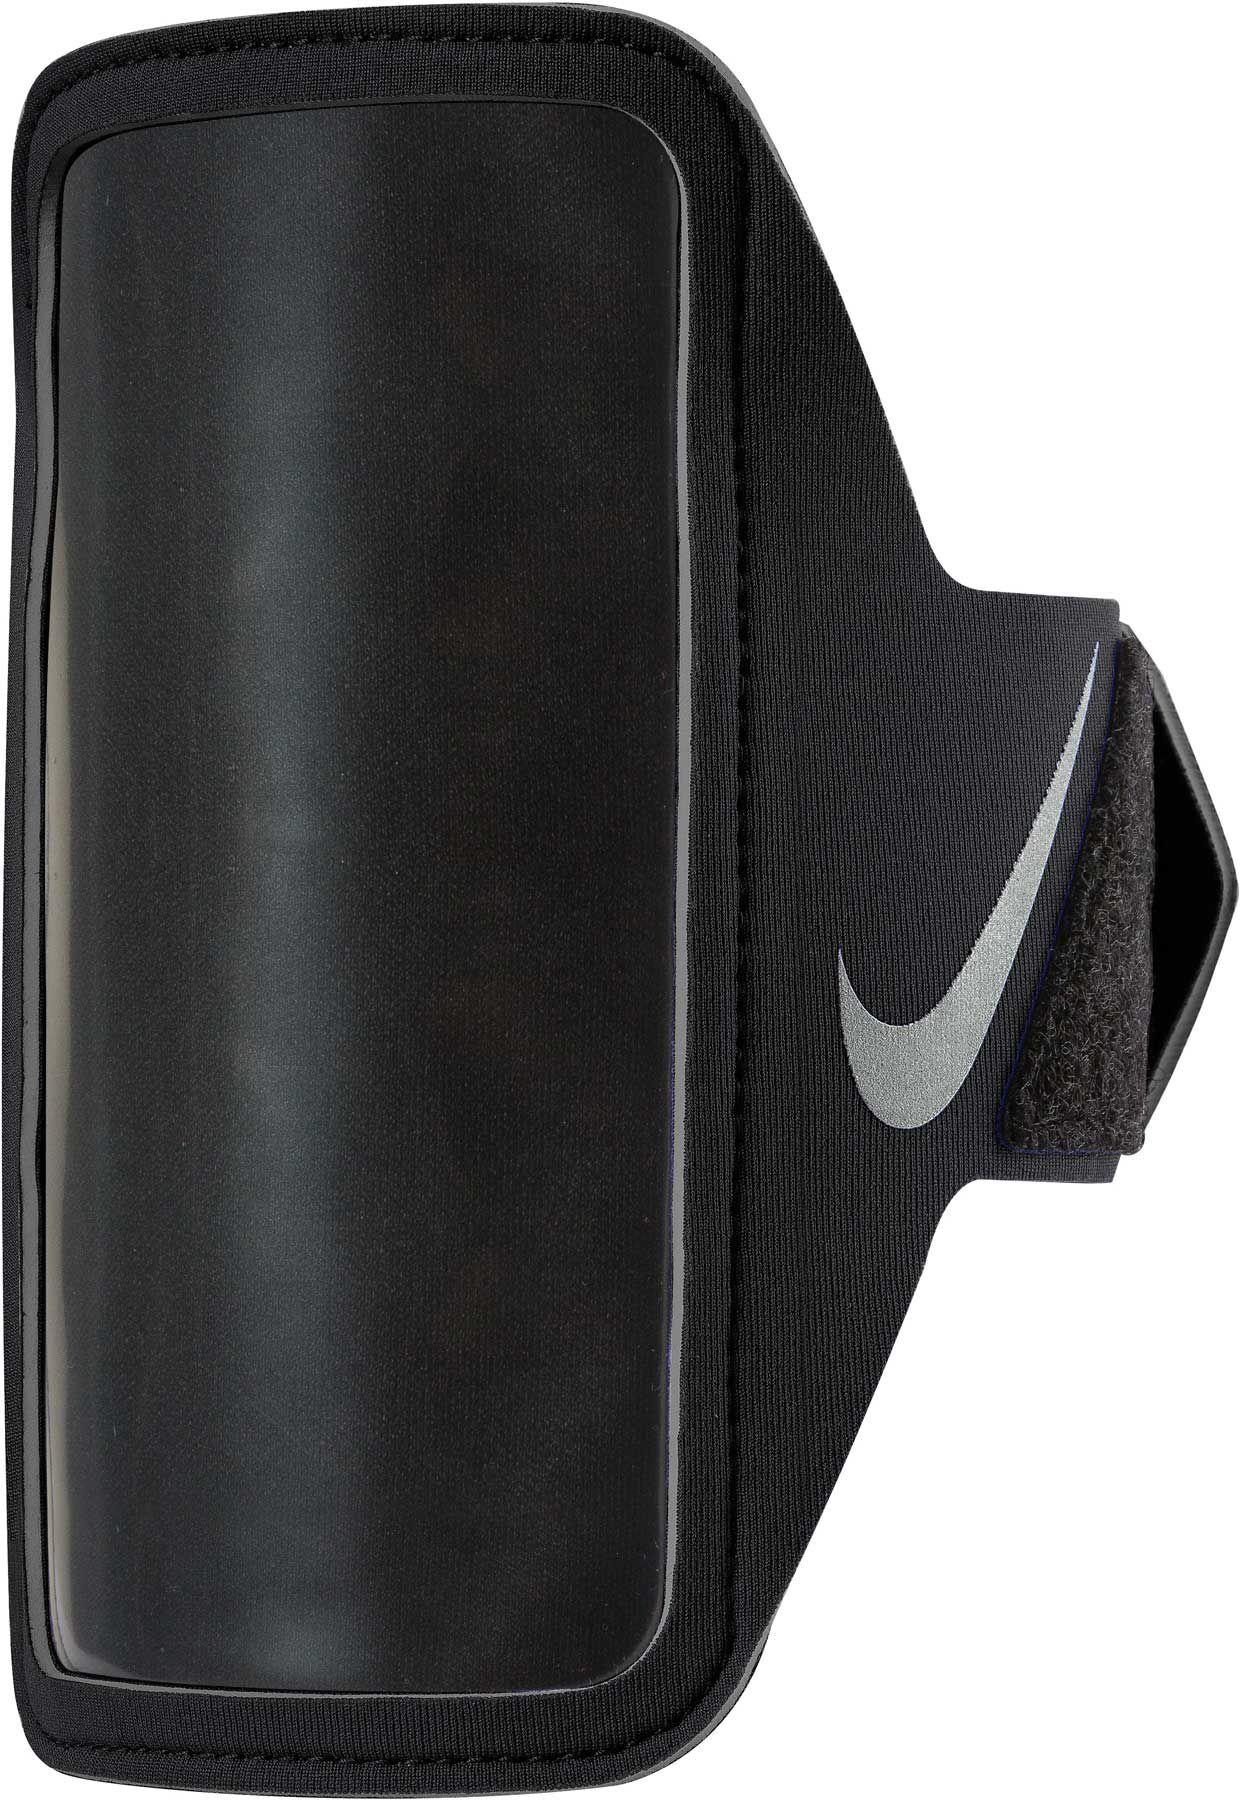 Nike Lean Running Arm Band, Black